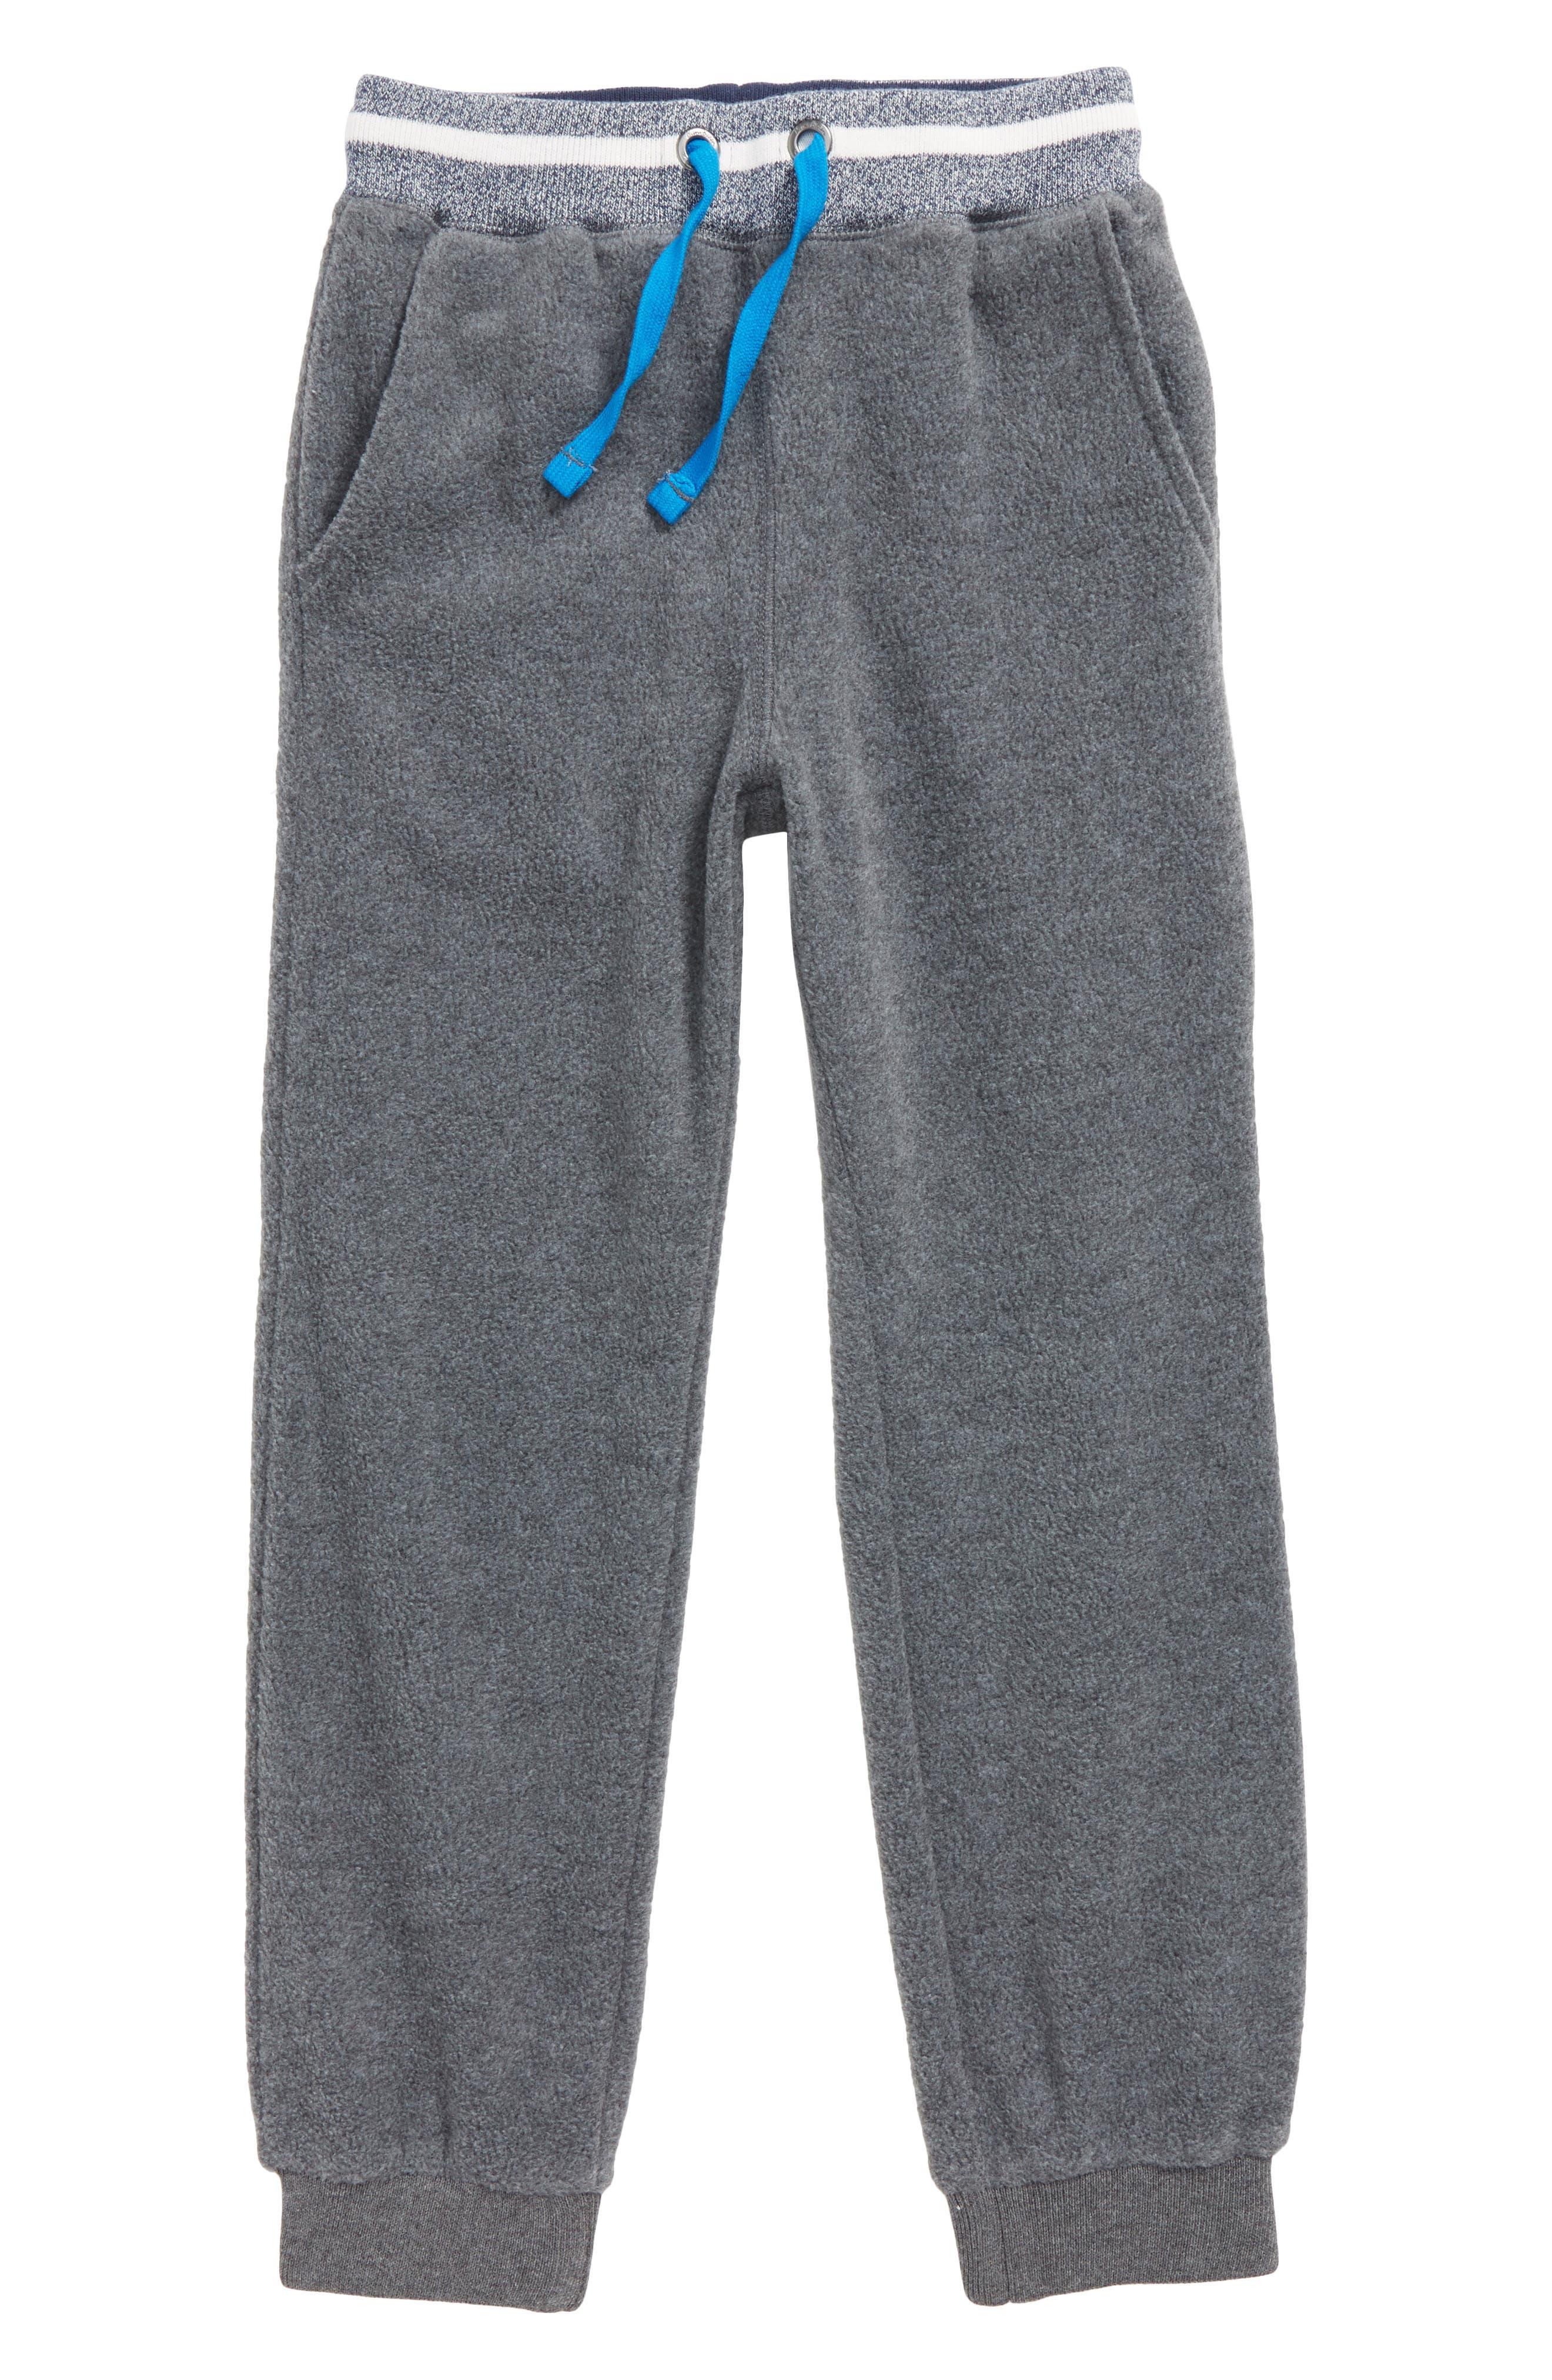 Mini Boden Microfleece Jogger Pants (Toddler Boys, Little Boys & Big Boys)